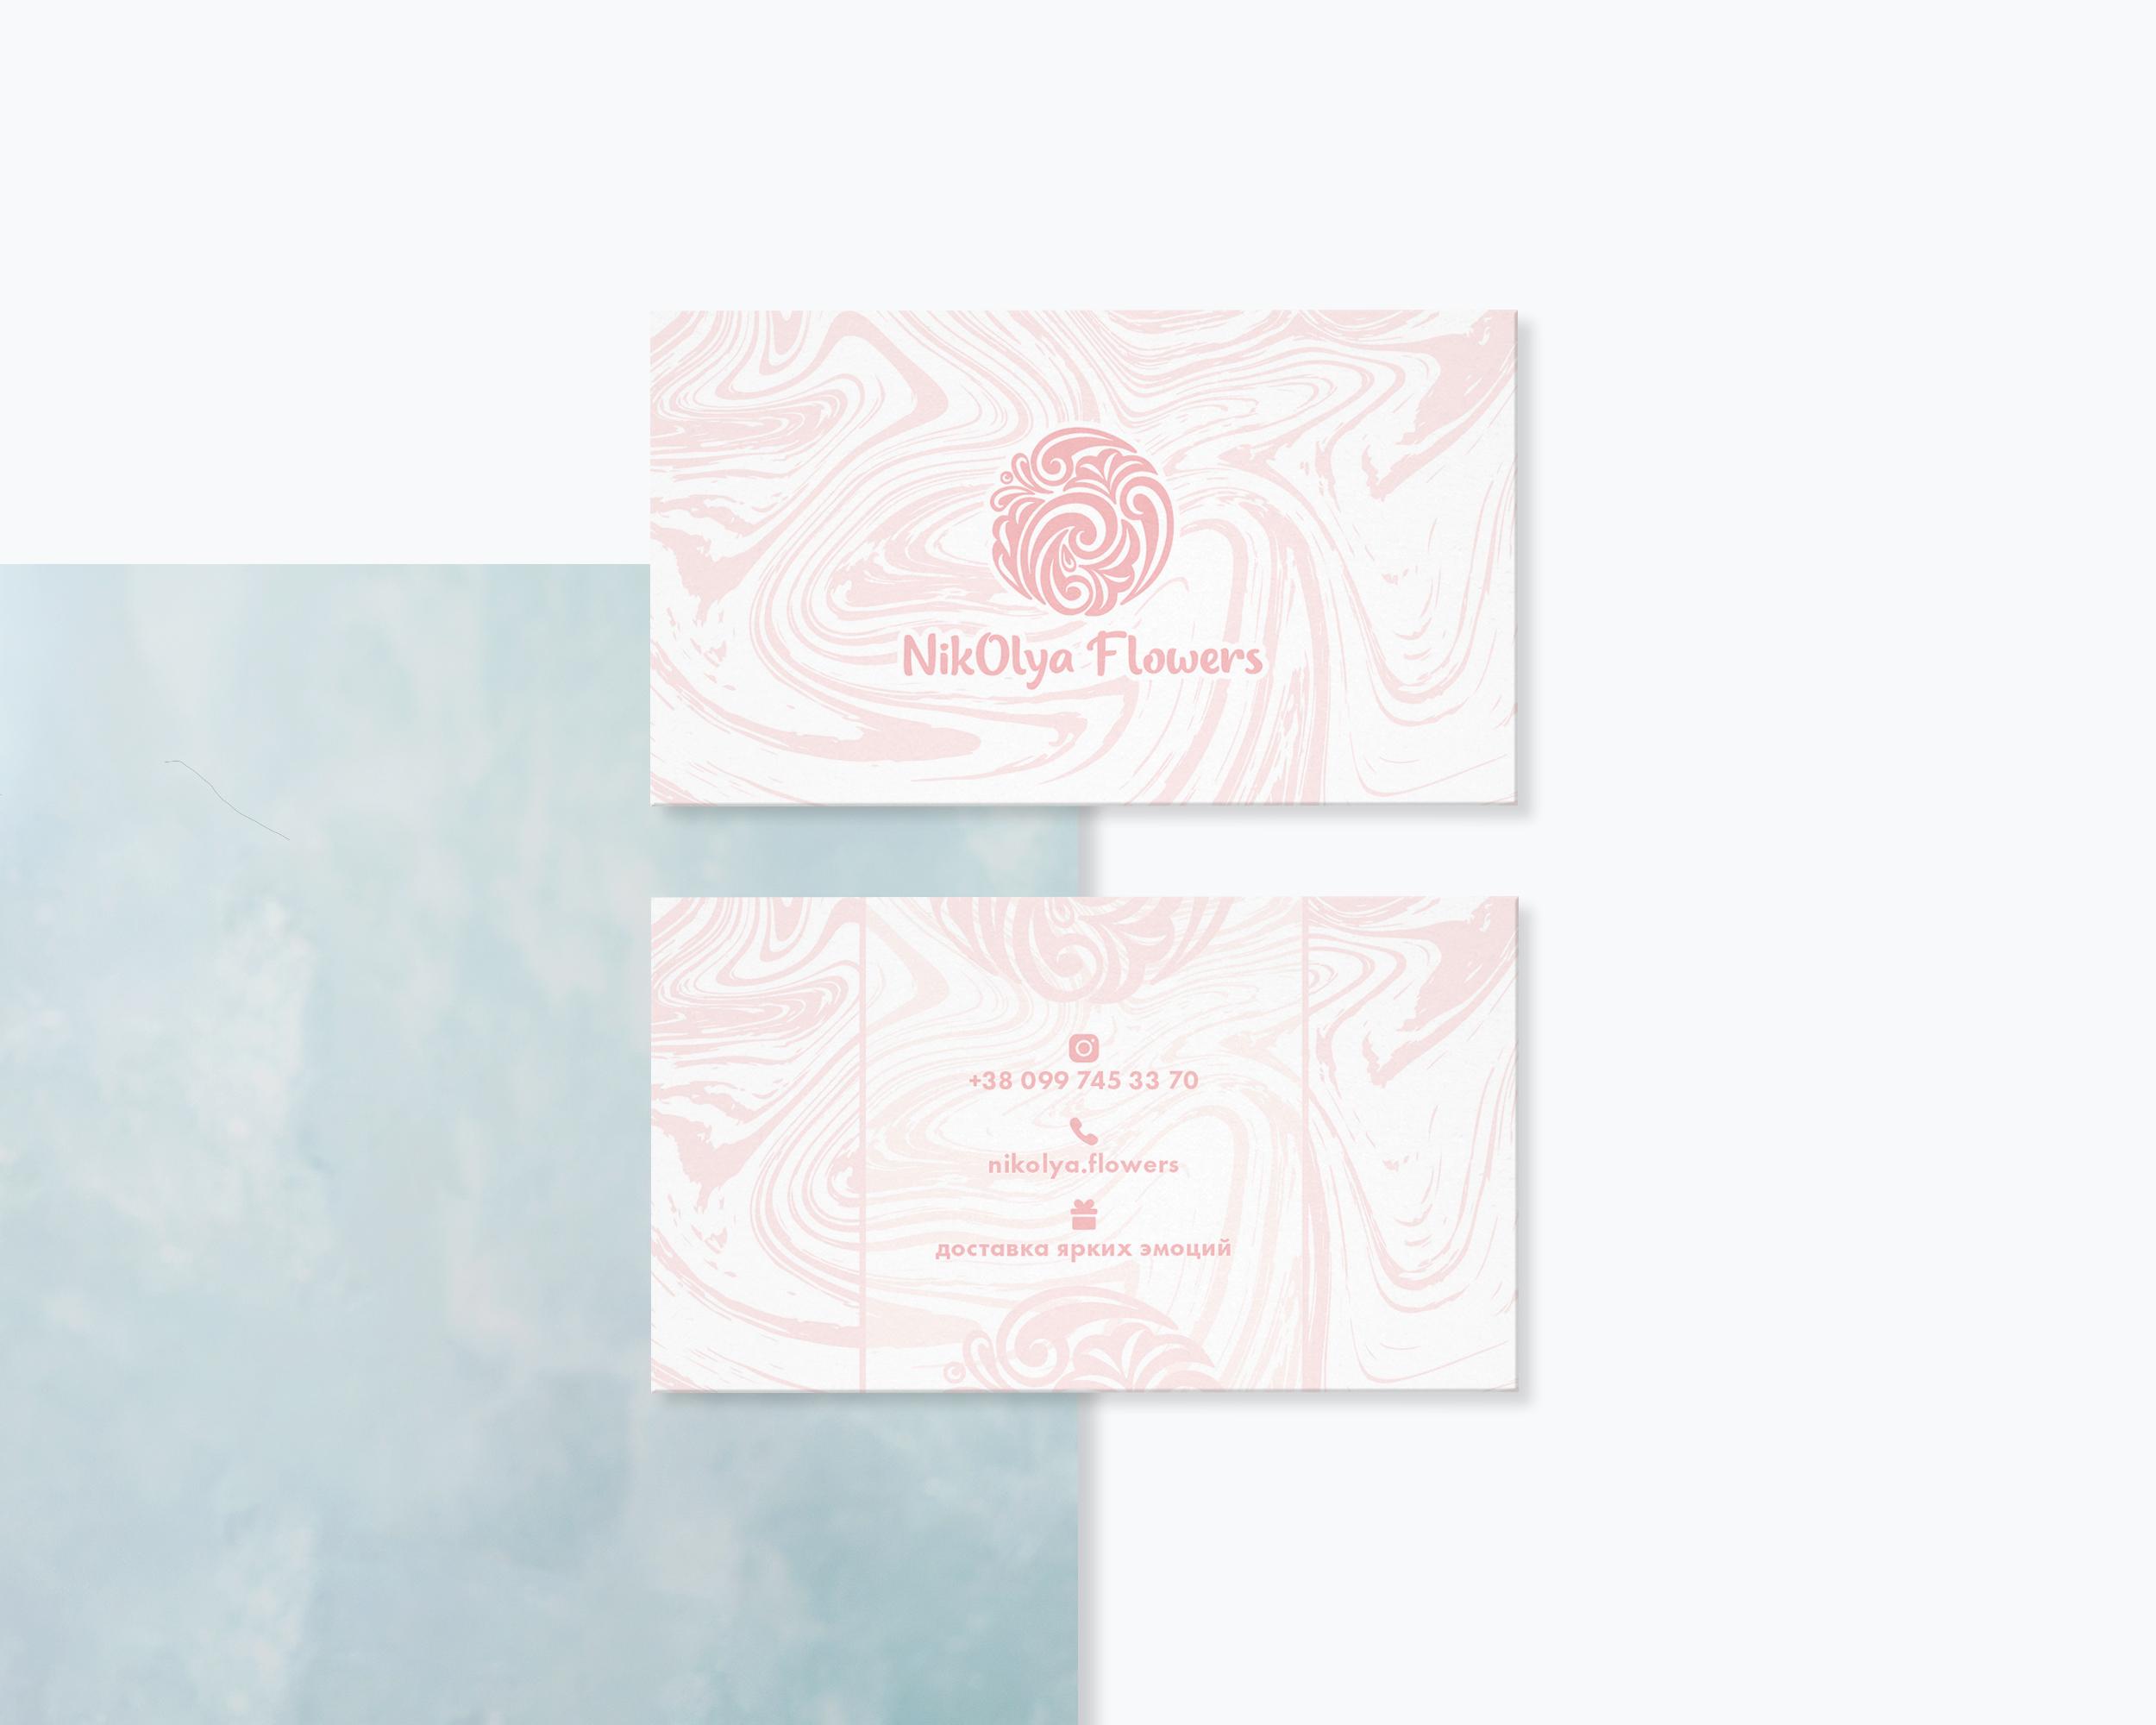 NikOlya Flowes bussiness card